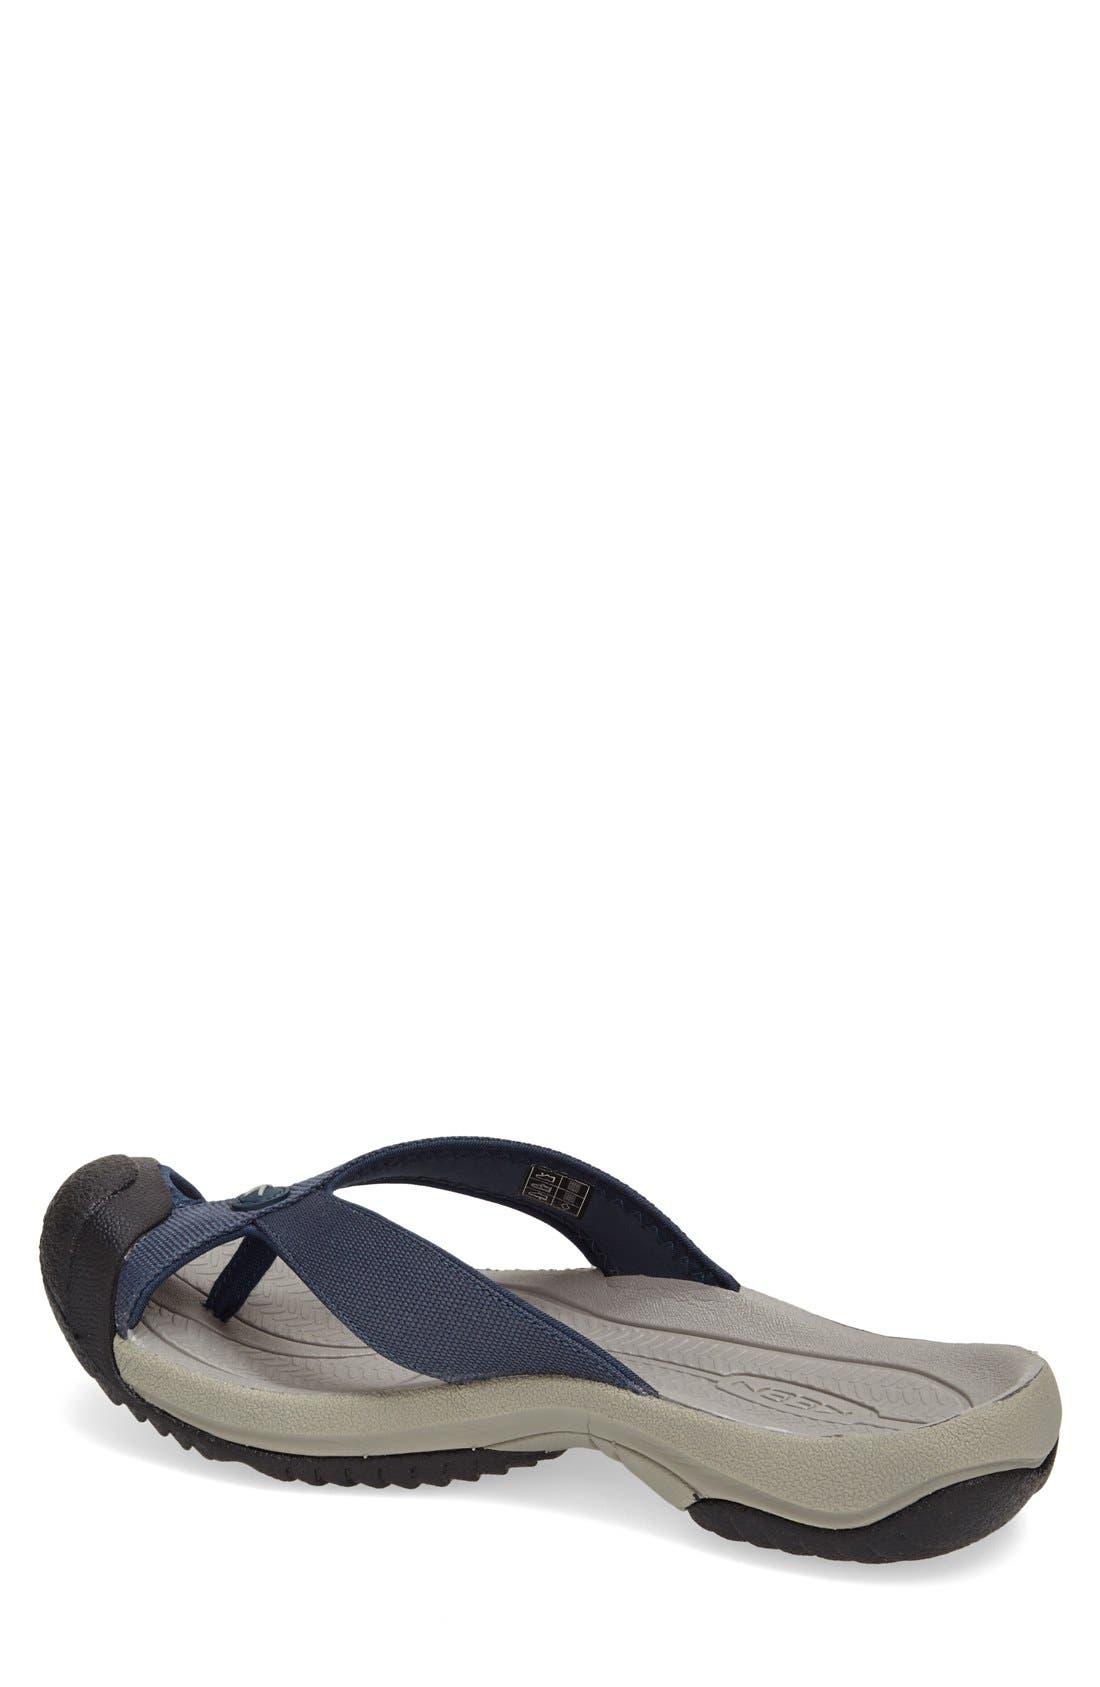 'Waimea H2' Water Thong Sandal,                             Alternate thumbnail 3, color,                             MIDNIGHT NAVY/ NEUTRAL